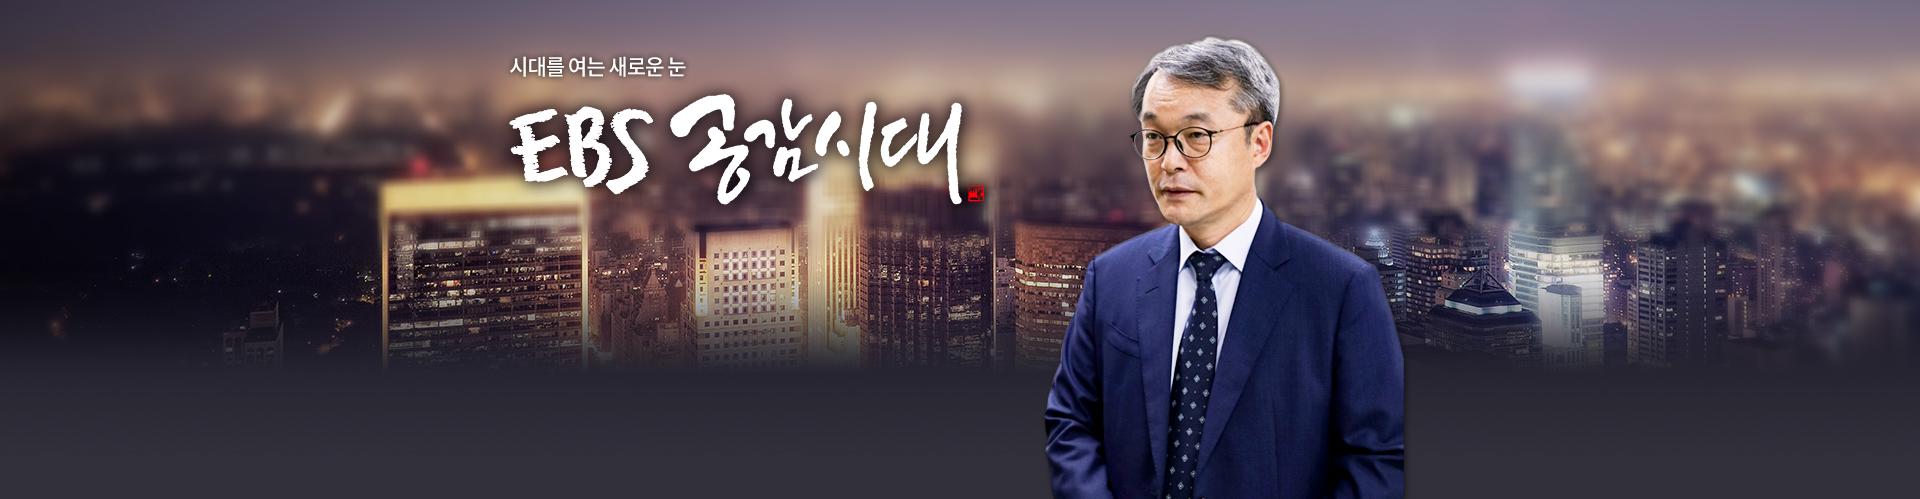 EBS 공감시대 - 0522(수)공감시대